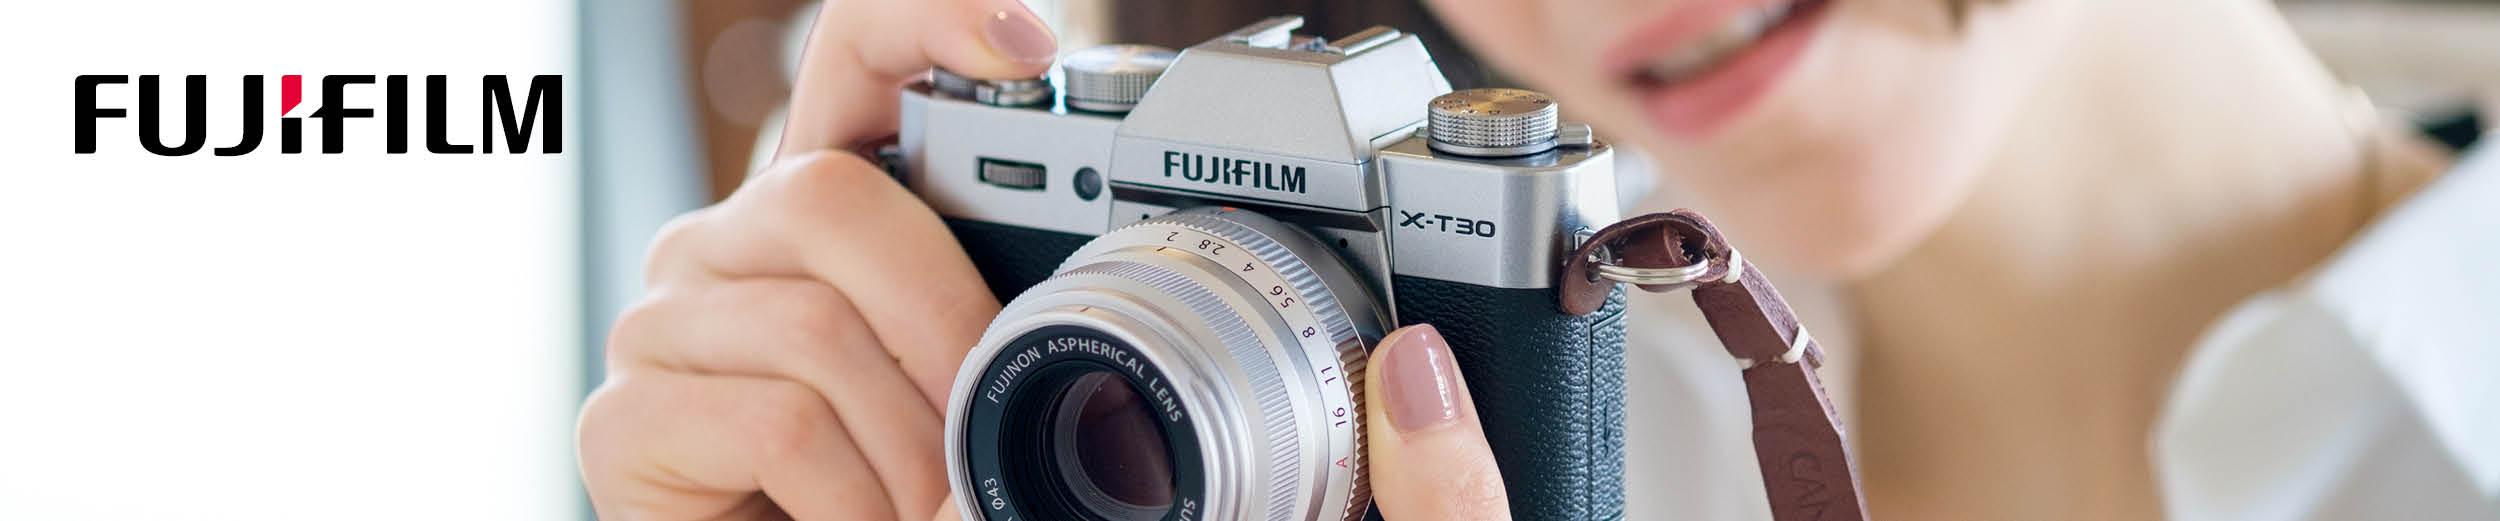 Fujifilm Markenstore Header